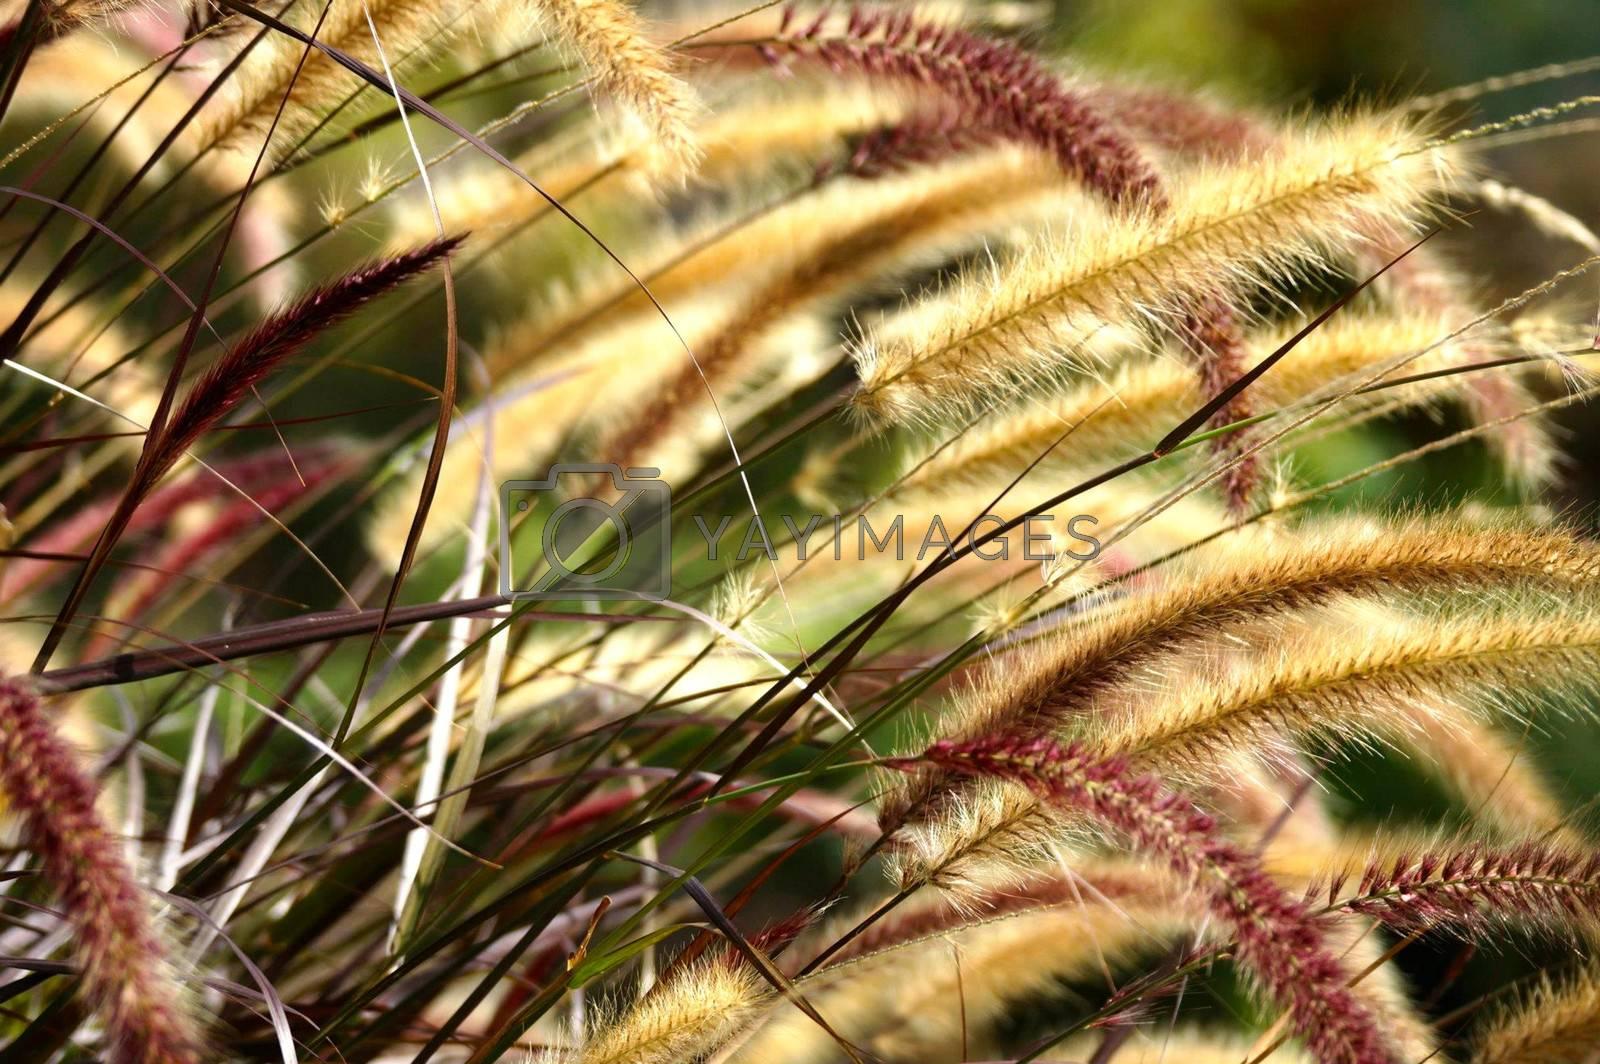 Royalty free image of gold grass by nattapatt